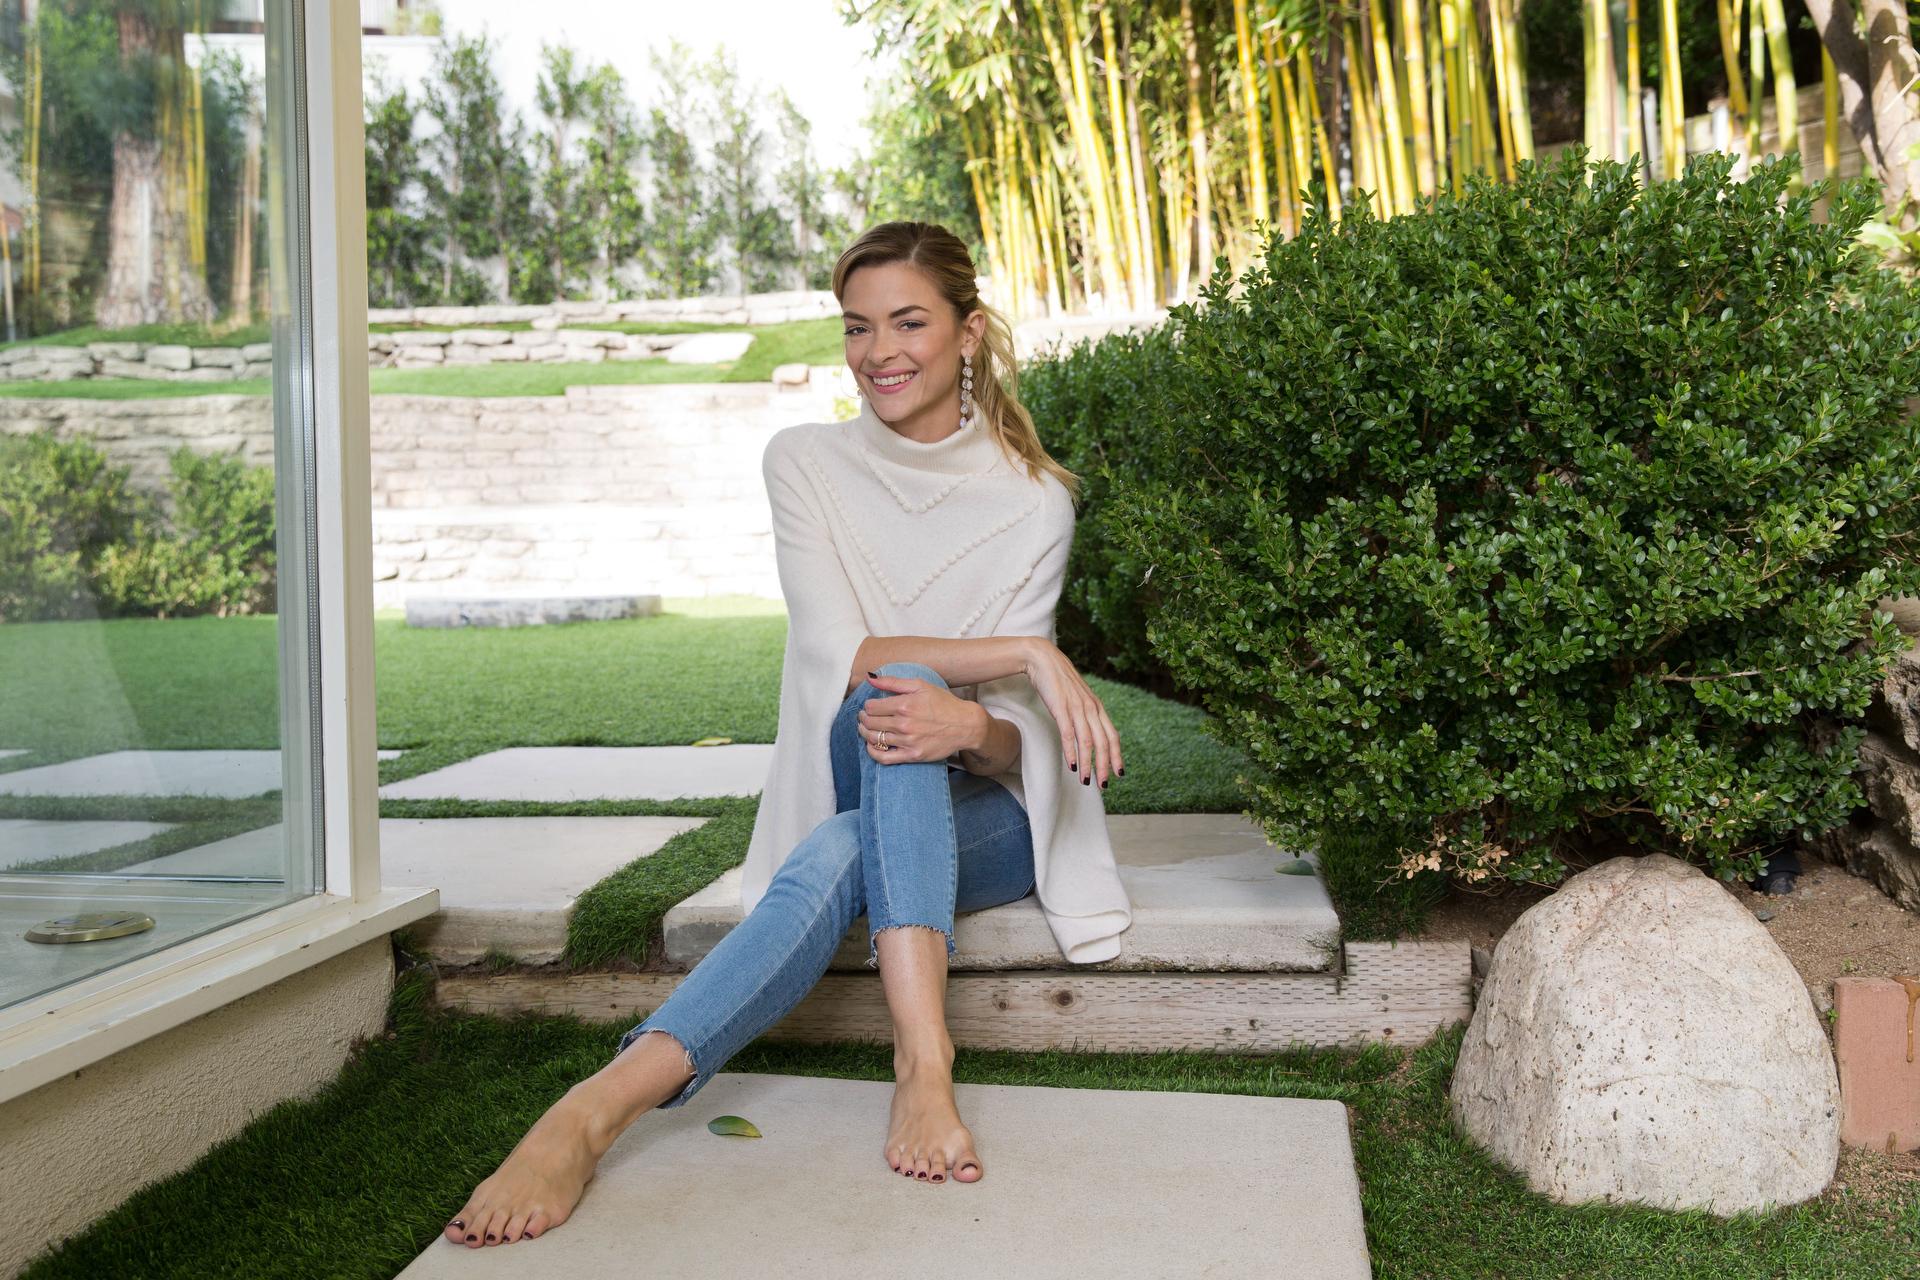 Feet Jaime King nudes (31 photo), Sexy, Leaked, Boobs, braless 2020